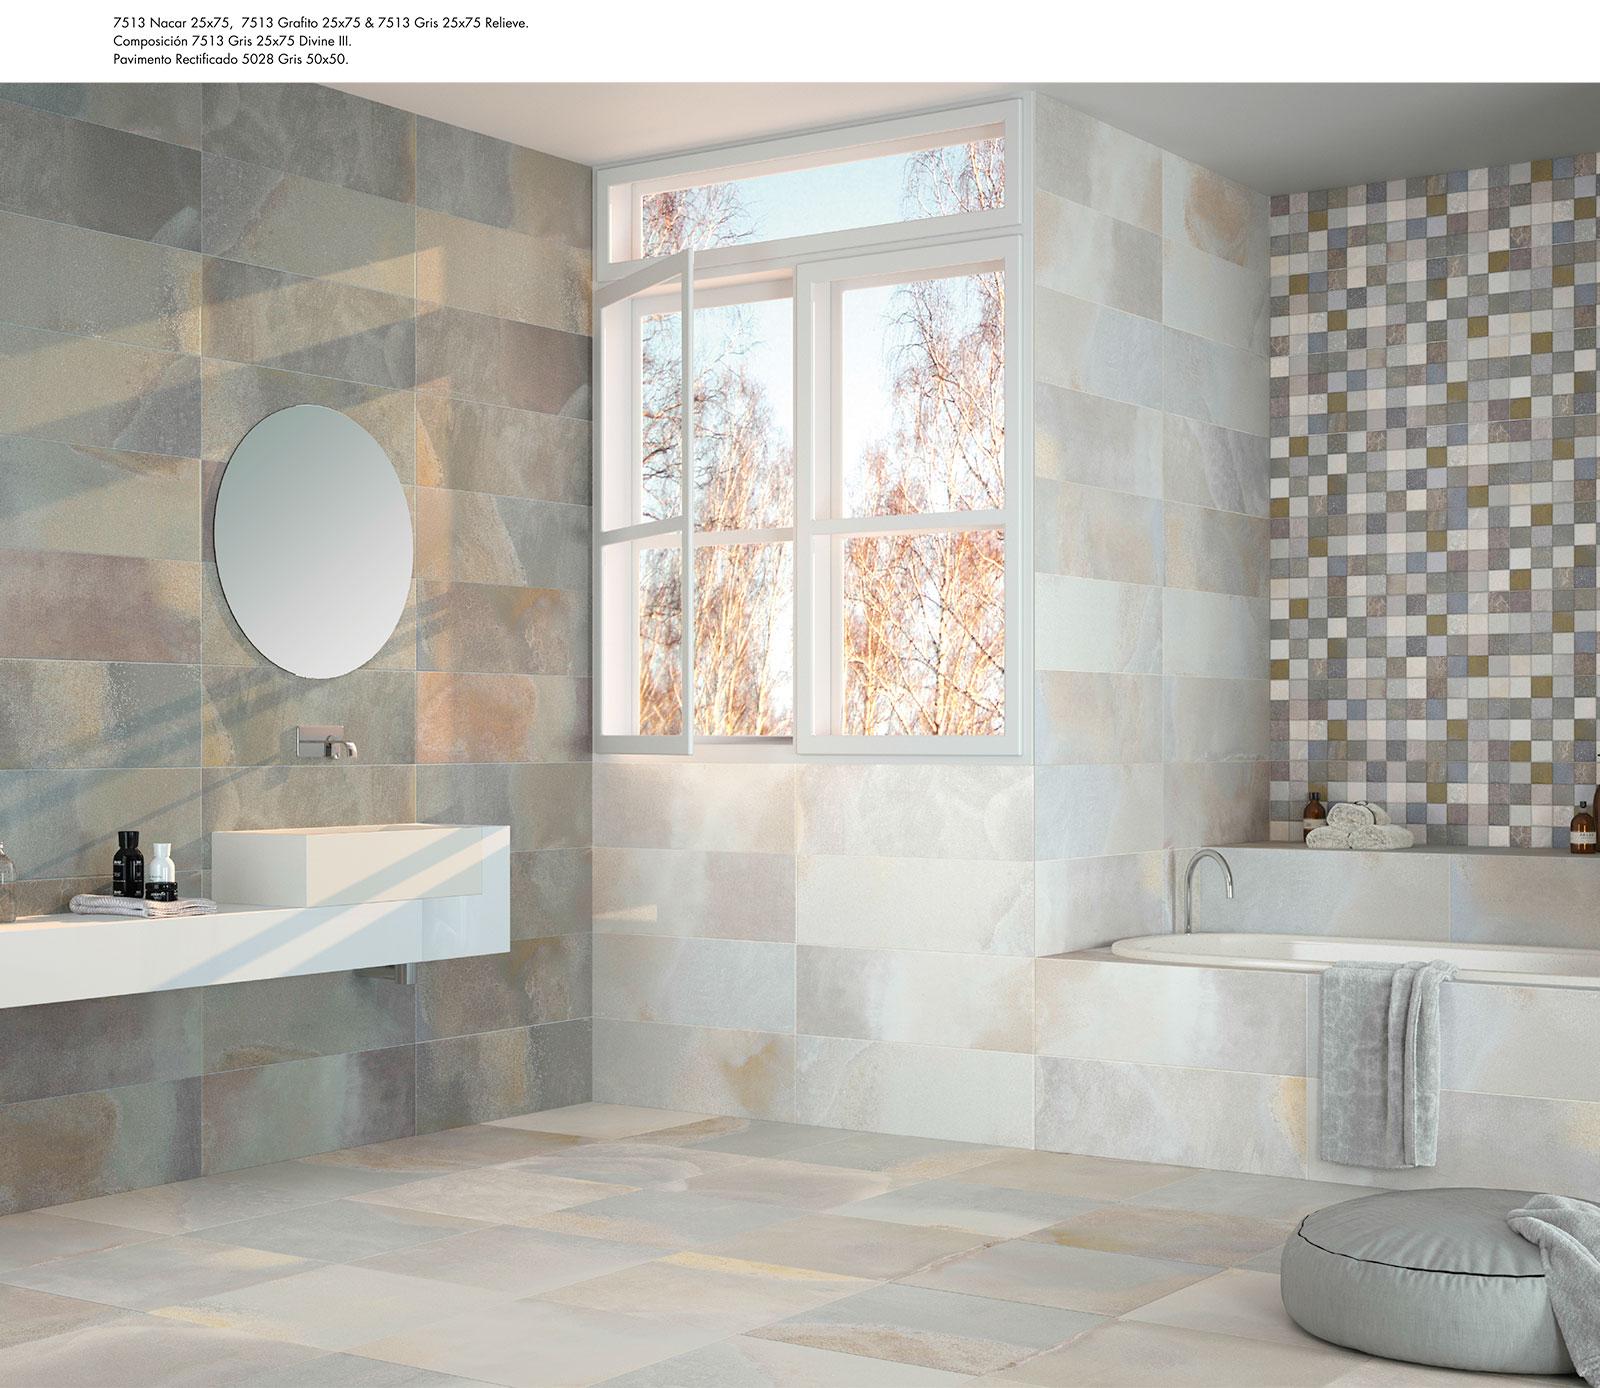 Serie 25x75 7513 azulejos y pavimentos mart n - Azulejos martin ...